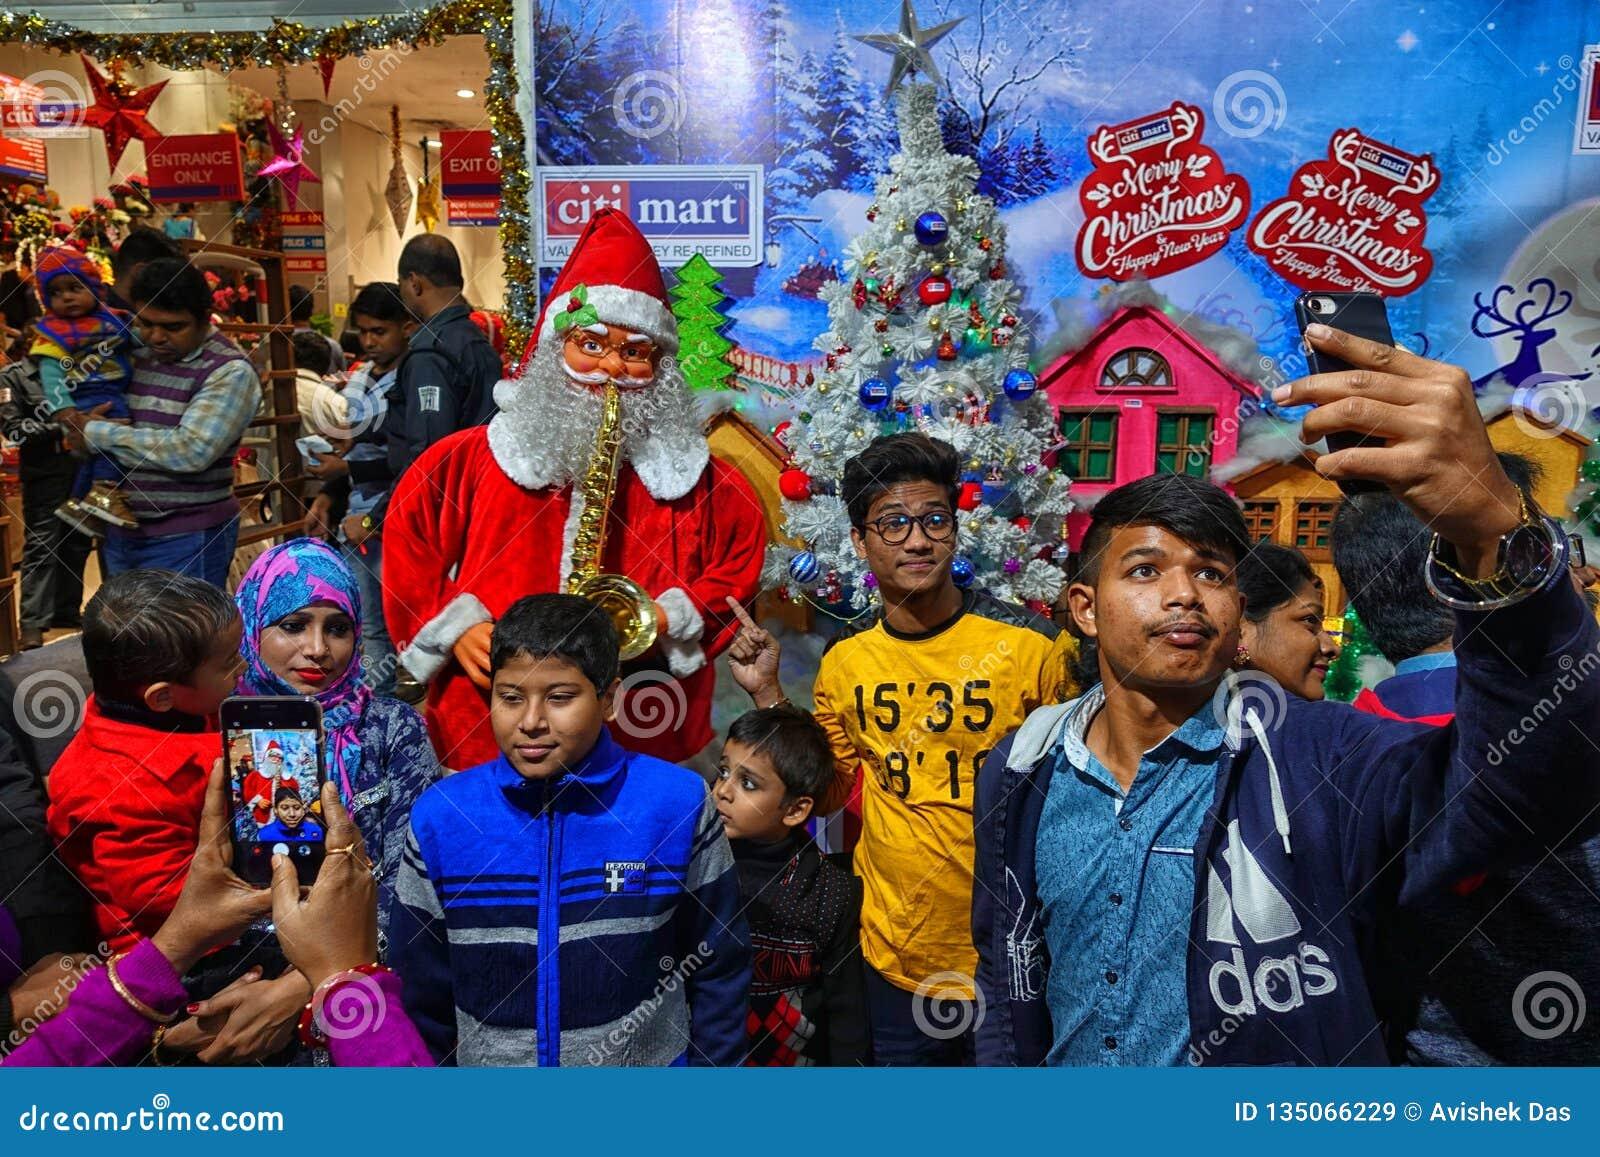 Christmas In India Images.Pre Christmas Celebration At Kolkata India Editorial Stock